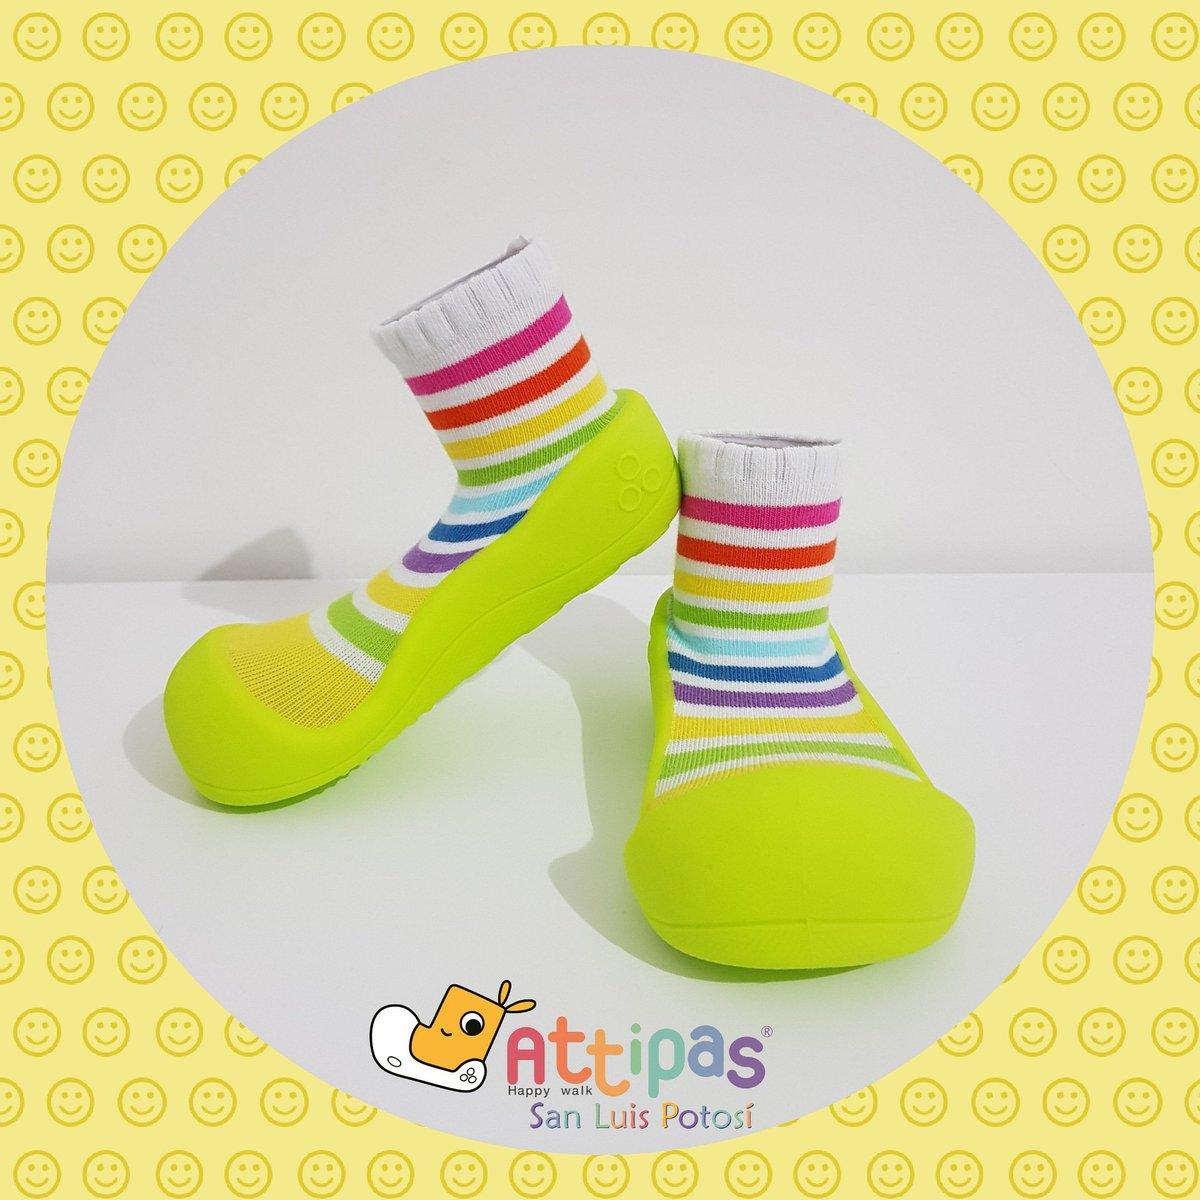 Tenemos nuestros Rainbow Green en talla 3XL para entrega inmediata. ¡Contáctanos! #attipas #SanLuisPotosí #México#desdeelpregateo #primerospasos #gateacaminasaltacrececonattipaspic.twitter.com/umHEqxIpv8